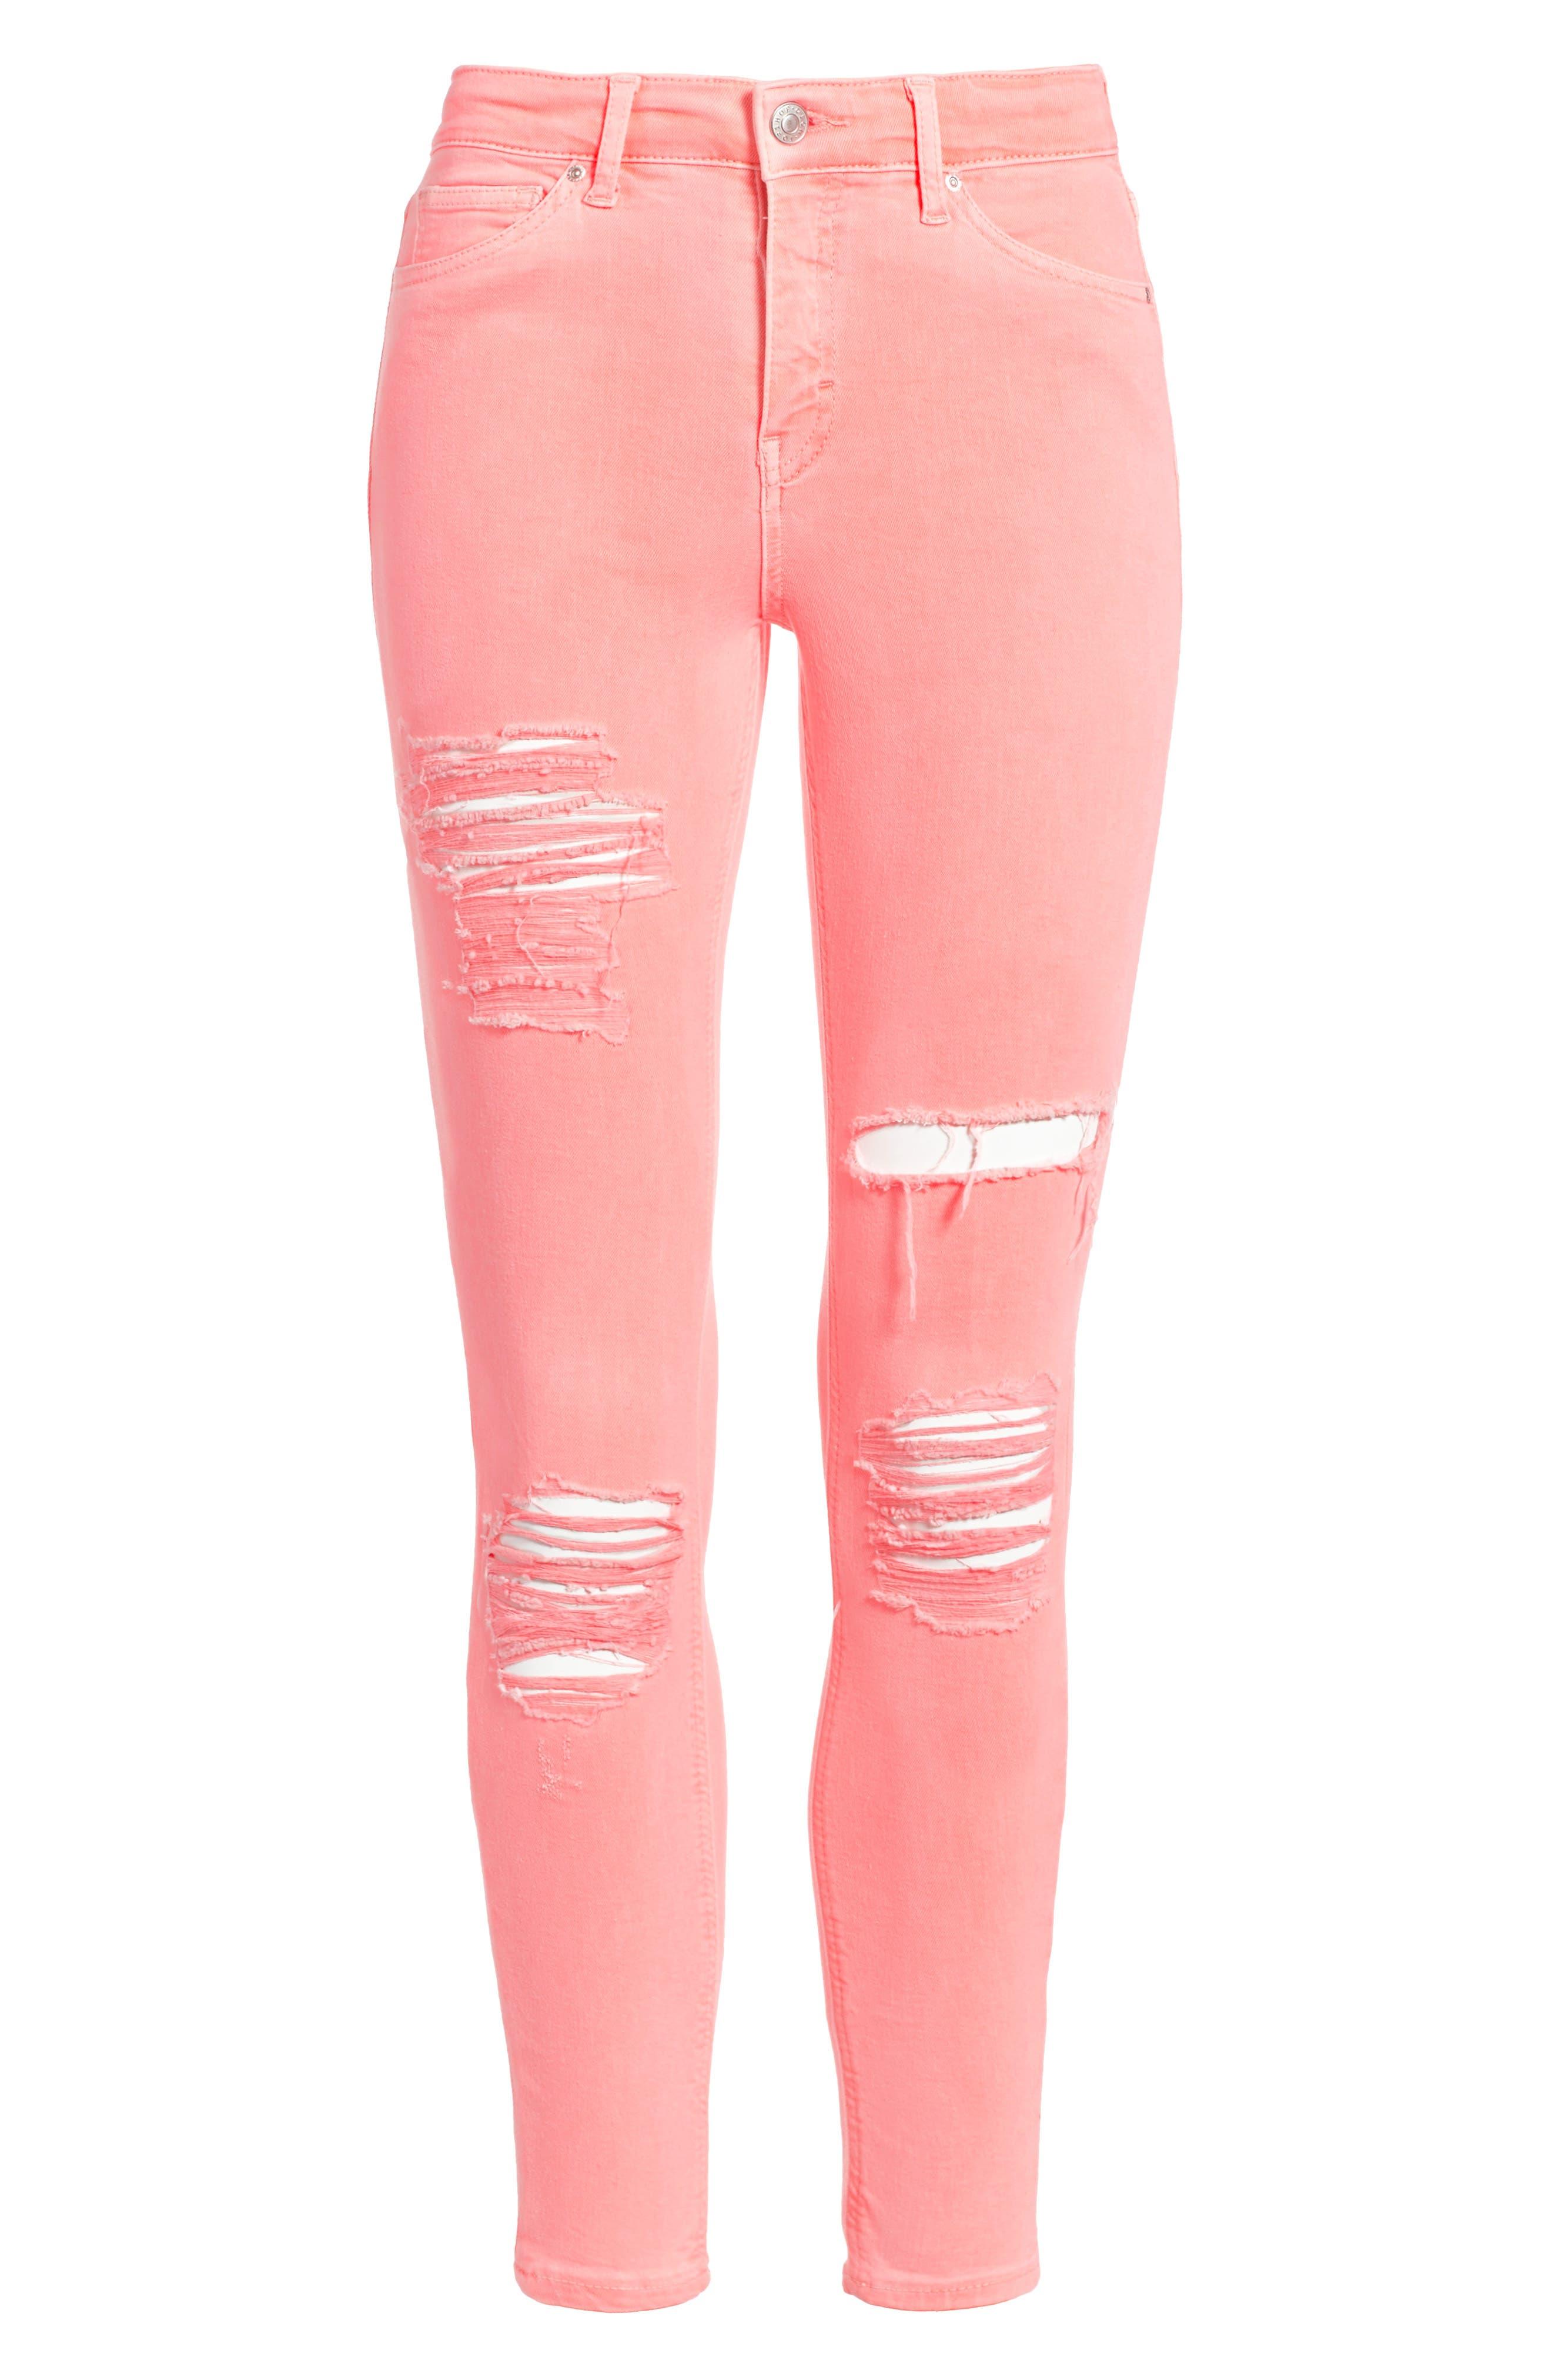 Alternate Image 1 Selected - Topshop Jamie Super Rip Skinny Jeans